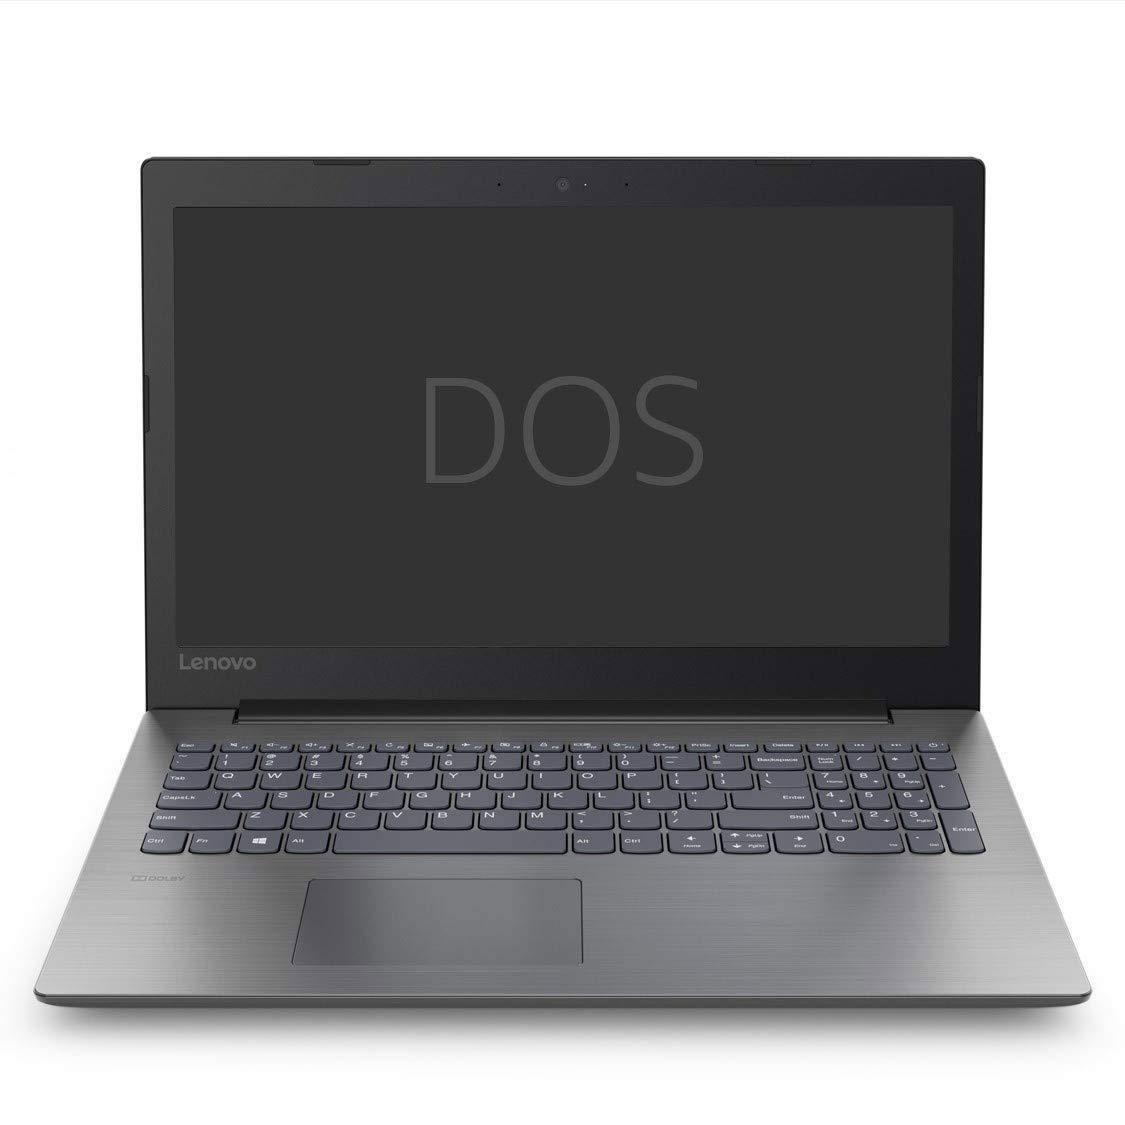 Lenovo Ideapad 330 AMD E2 15.6-inch Laptop